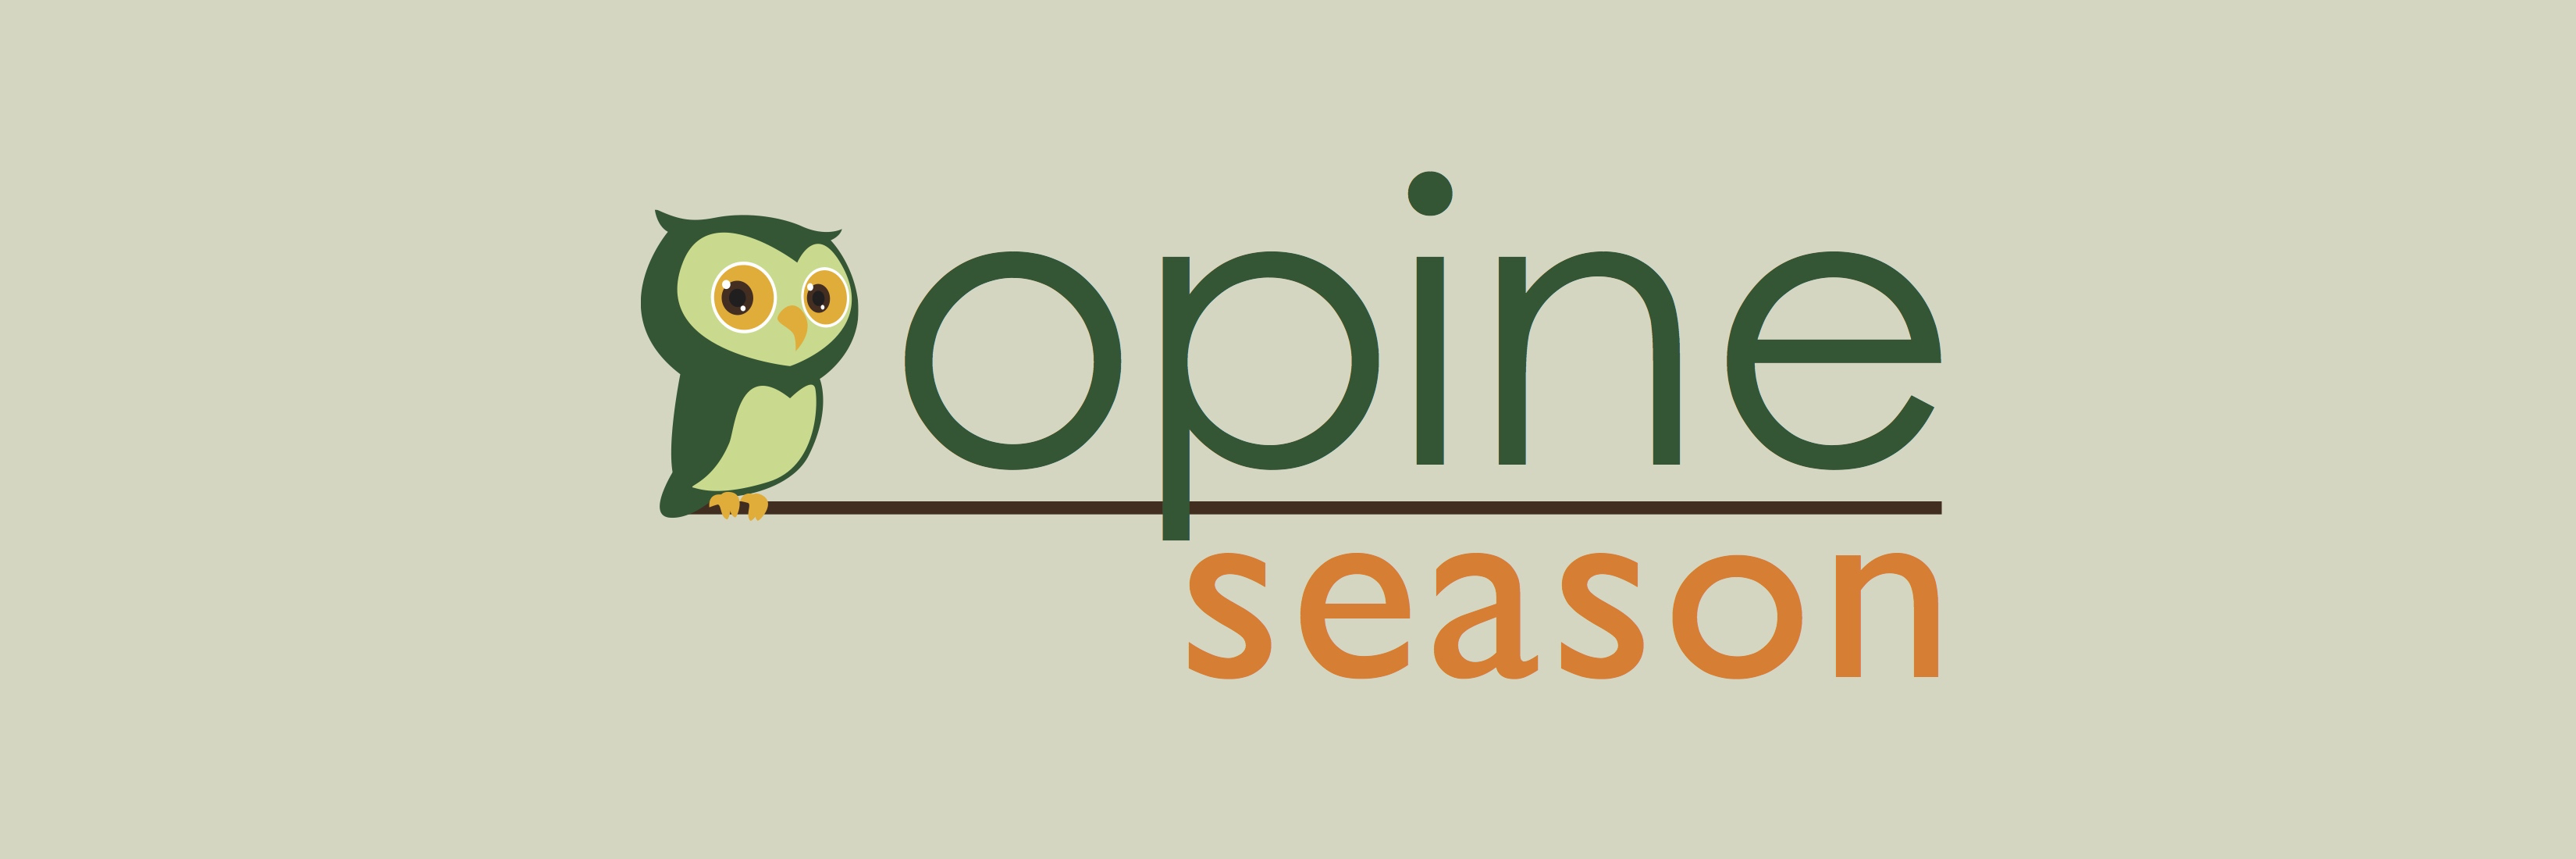 Opine Season